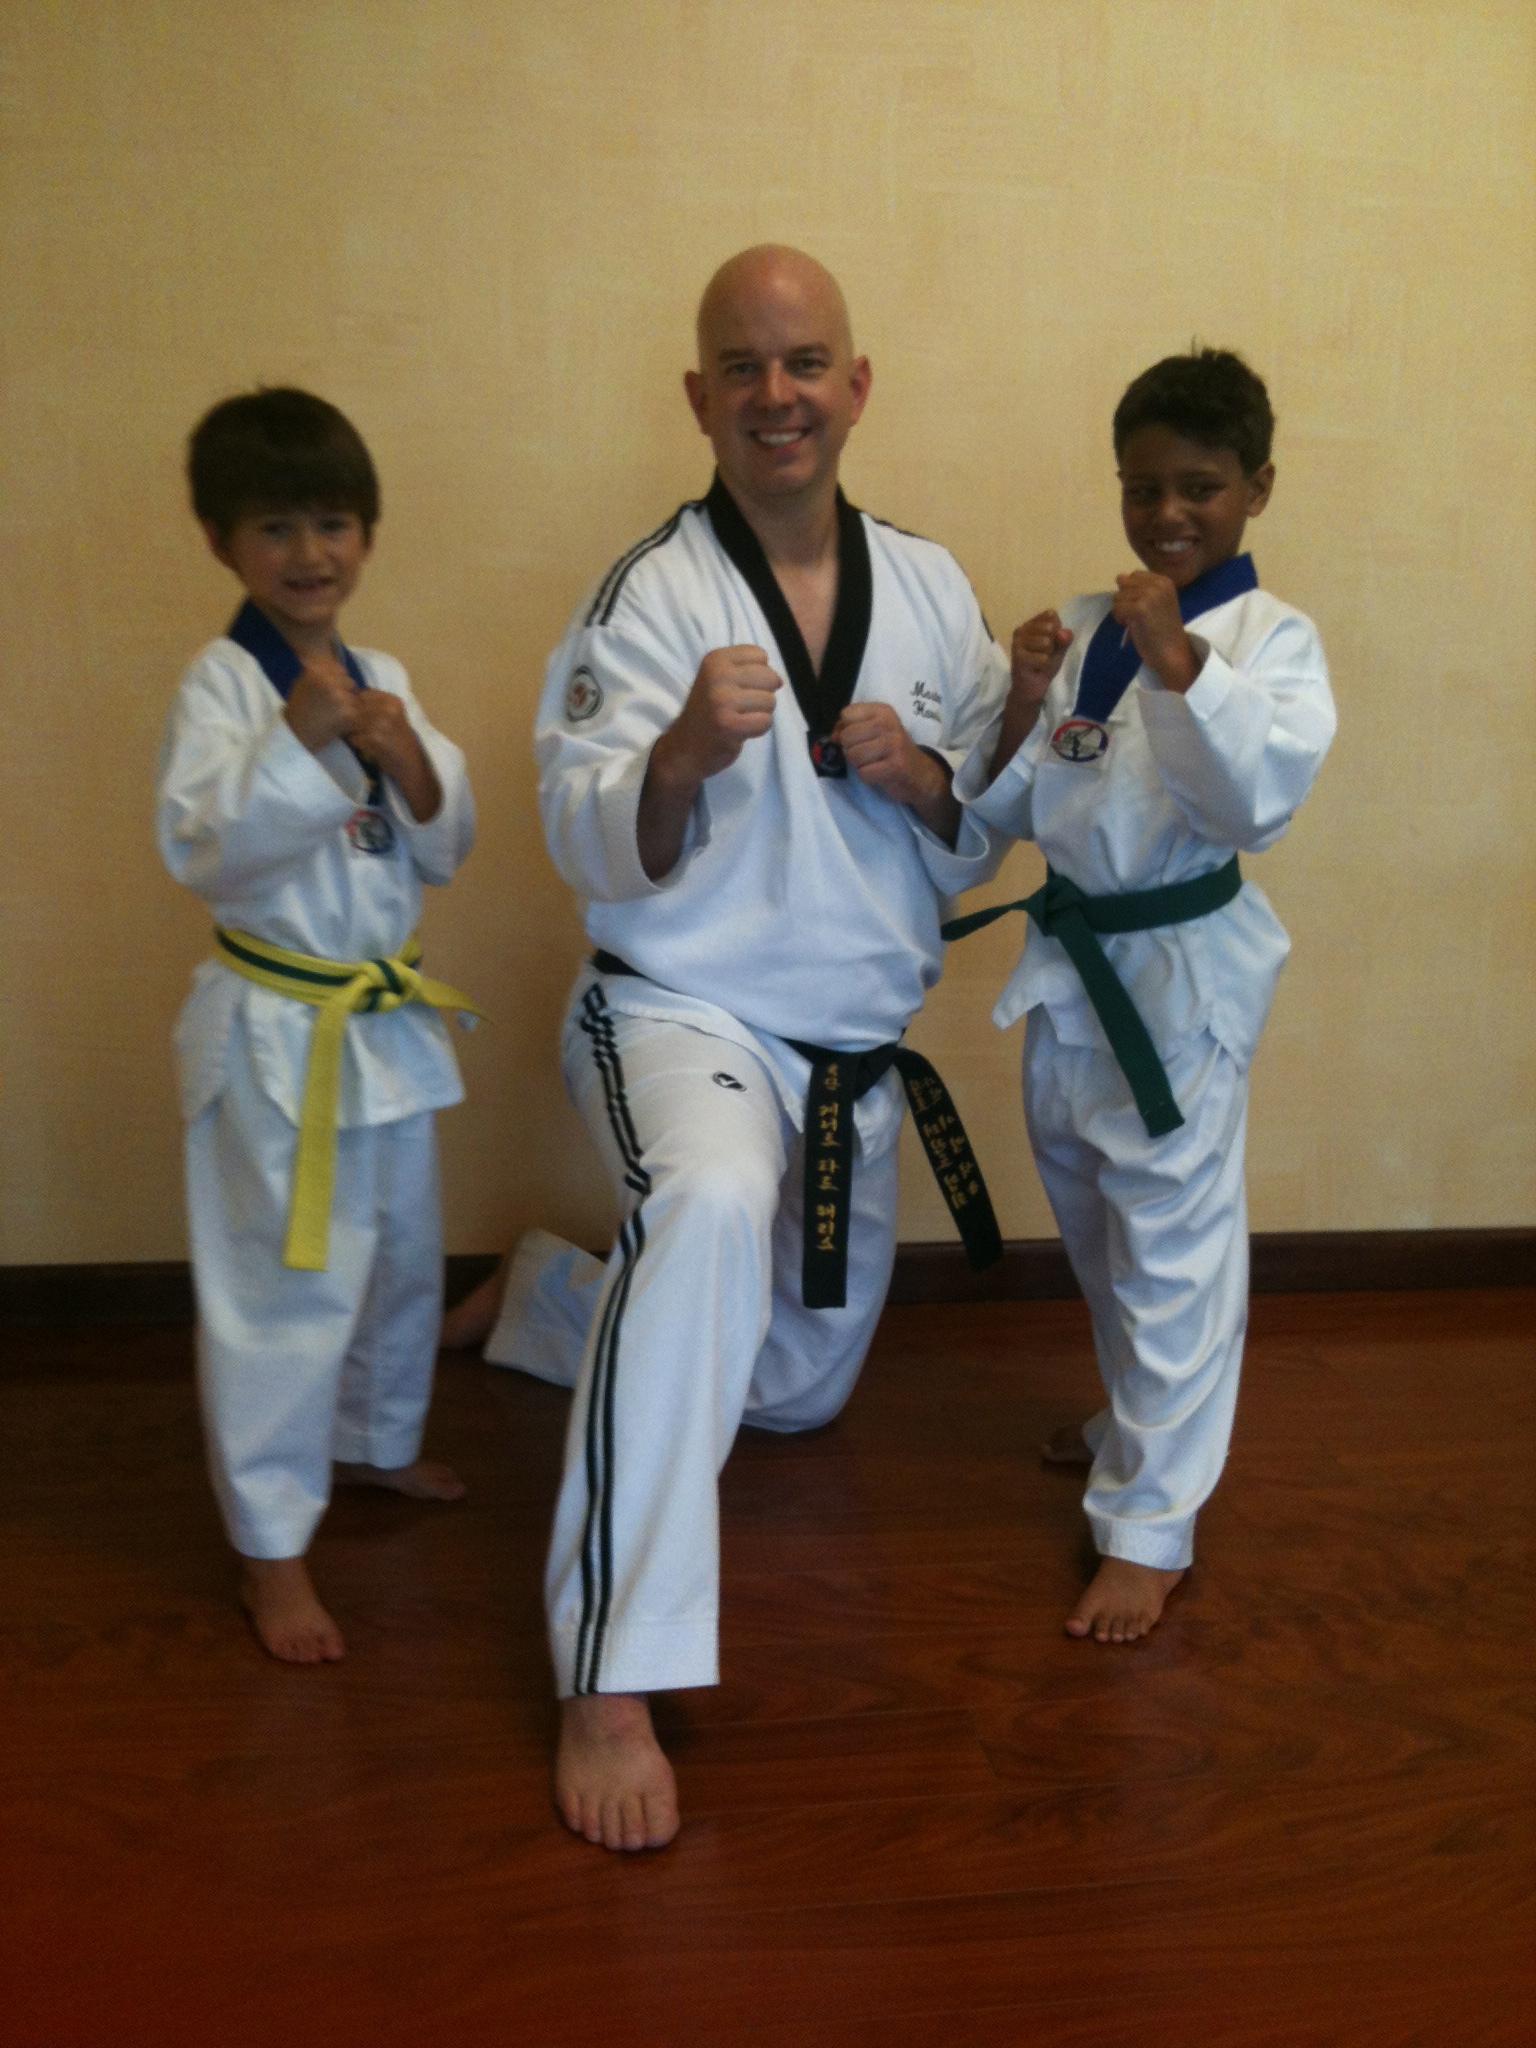 Martial Arts University image 1